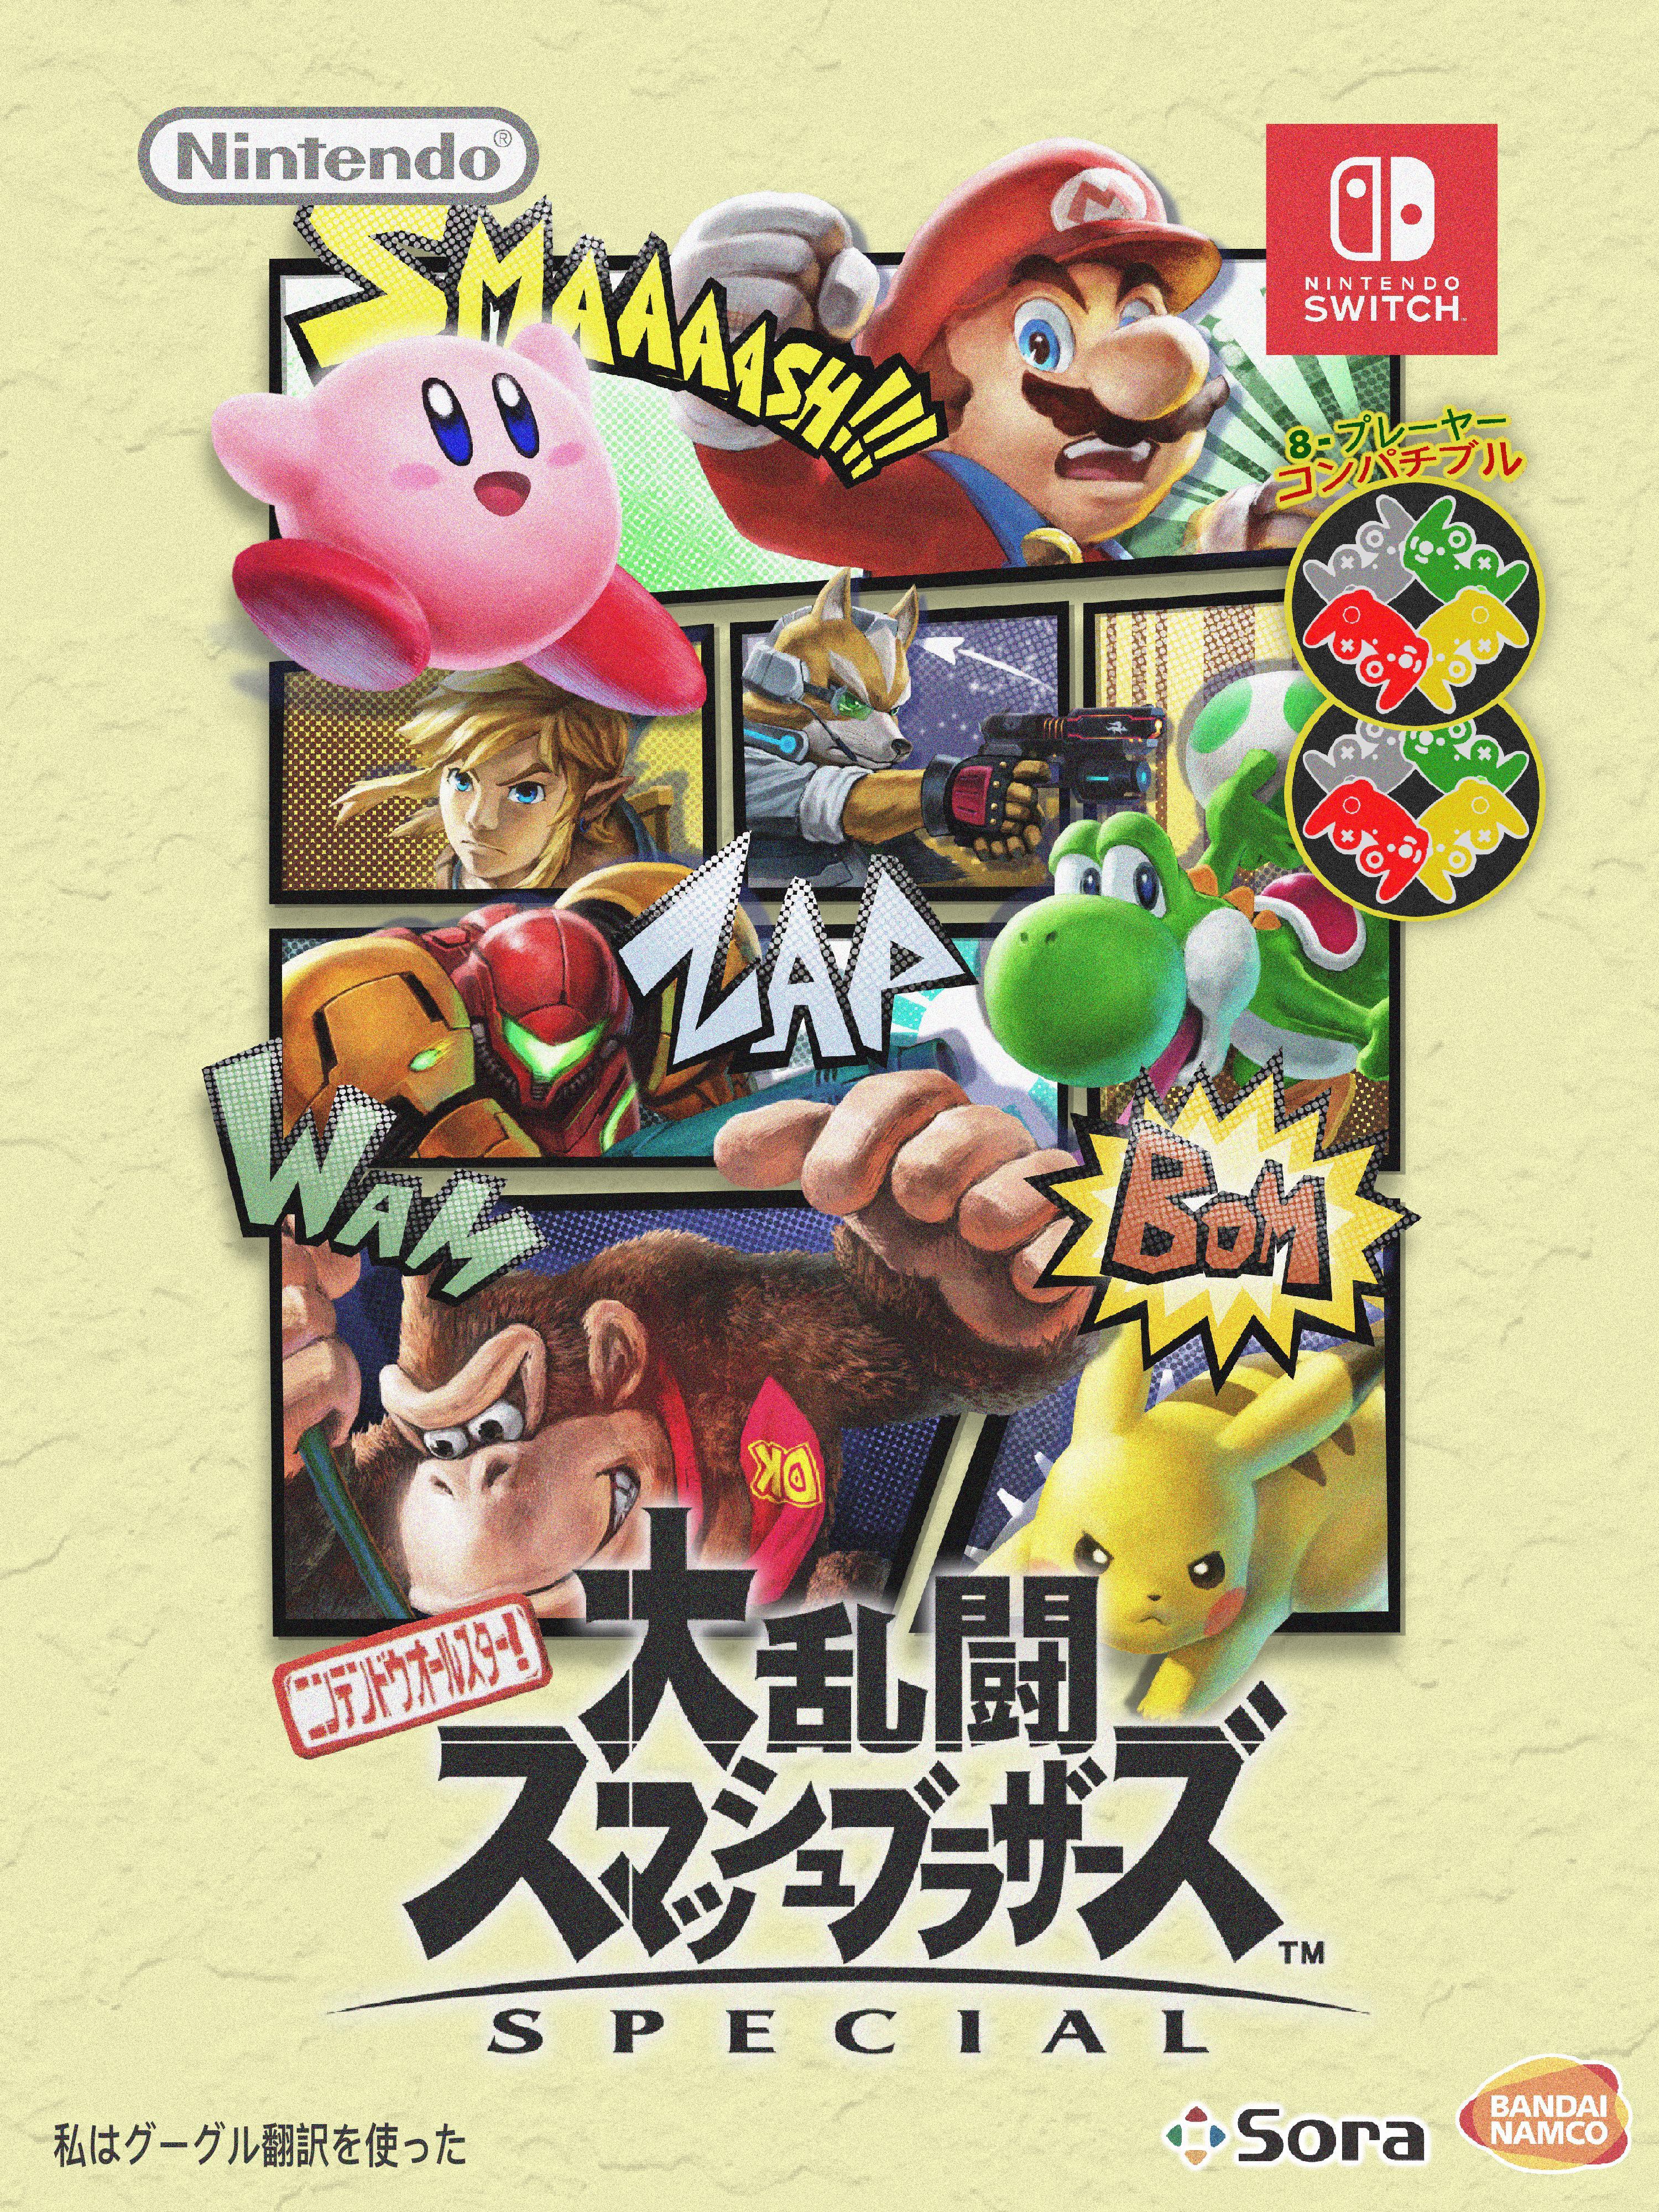 a smash 64 style smash ultimate poster